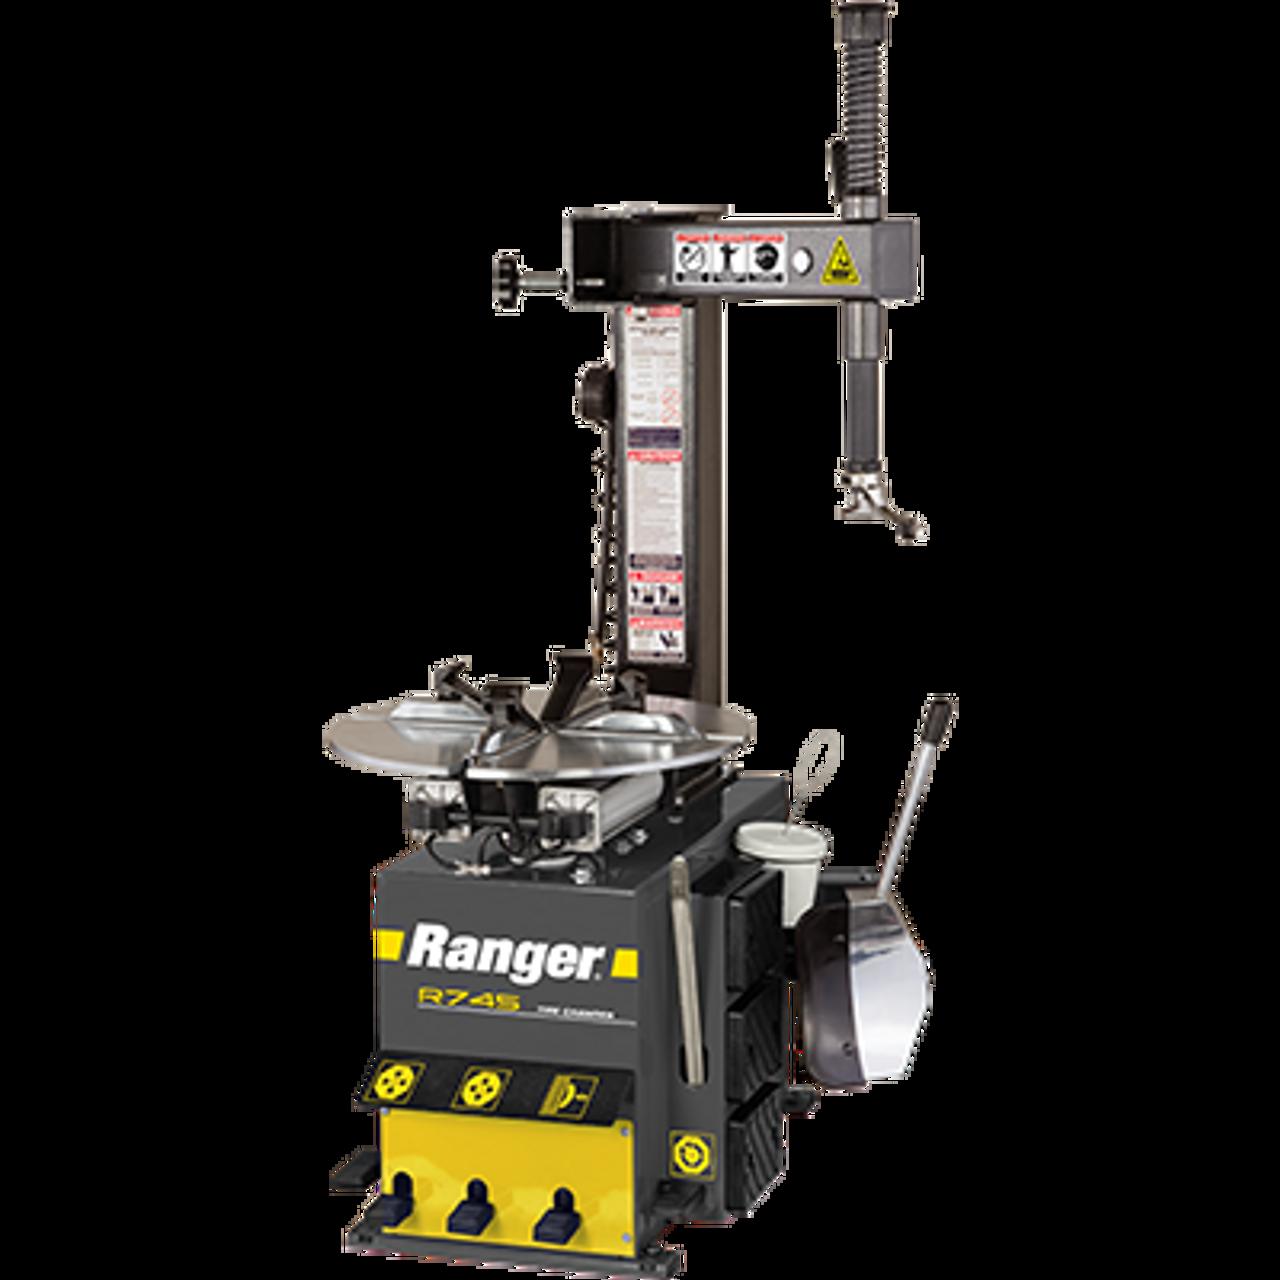 "RANGER R745 RimGuard™ 21"" Capacity Entry-Level Tire Changer"